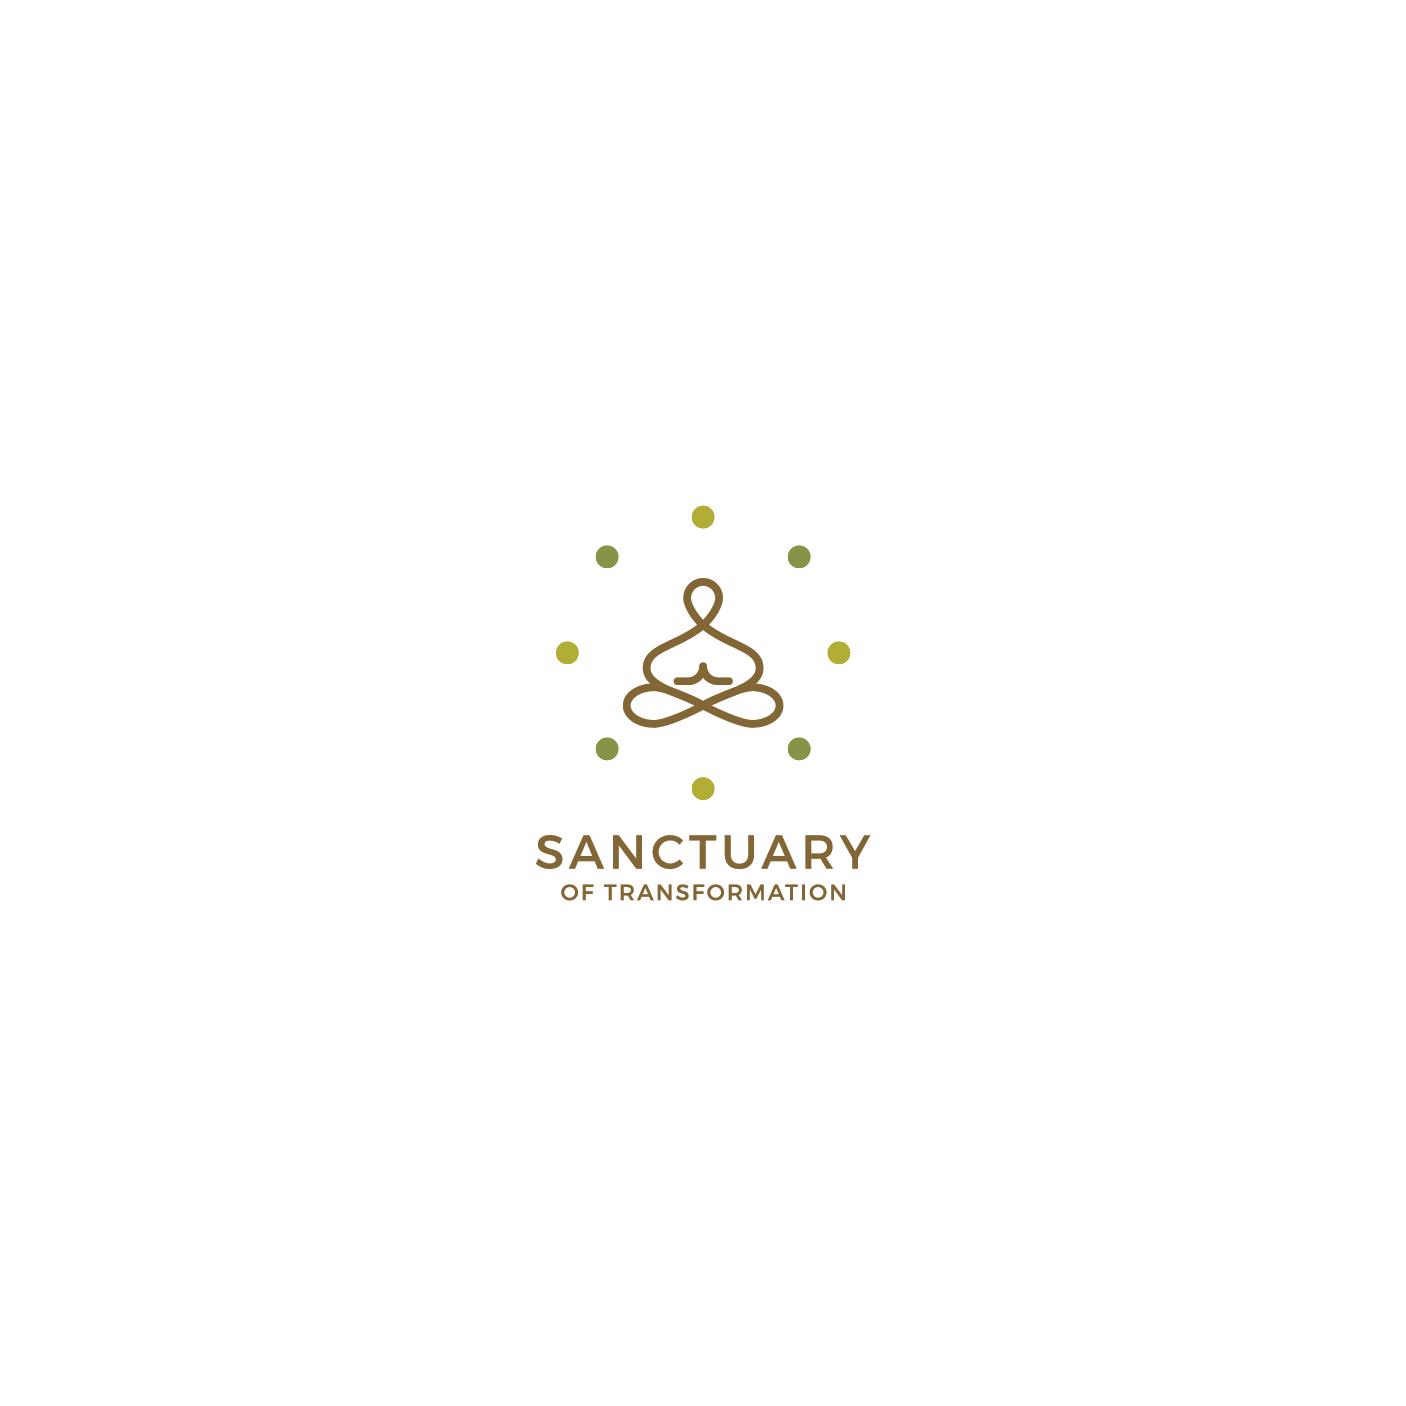 Logo Design by 354studio - Entry No. 38 in the Logo Design Contest Fun Logo Design for Sanctuary of Transformation.